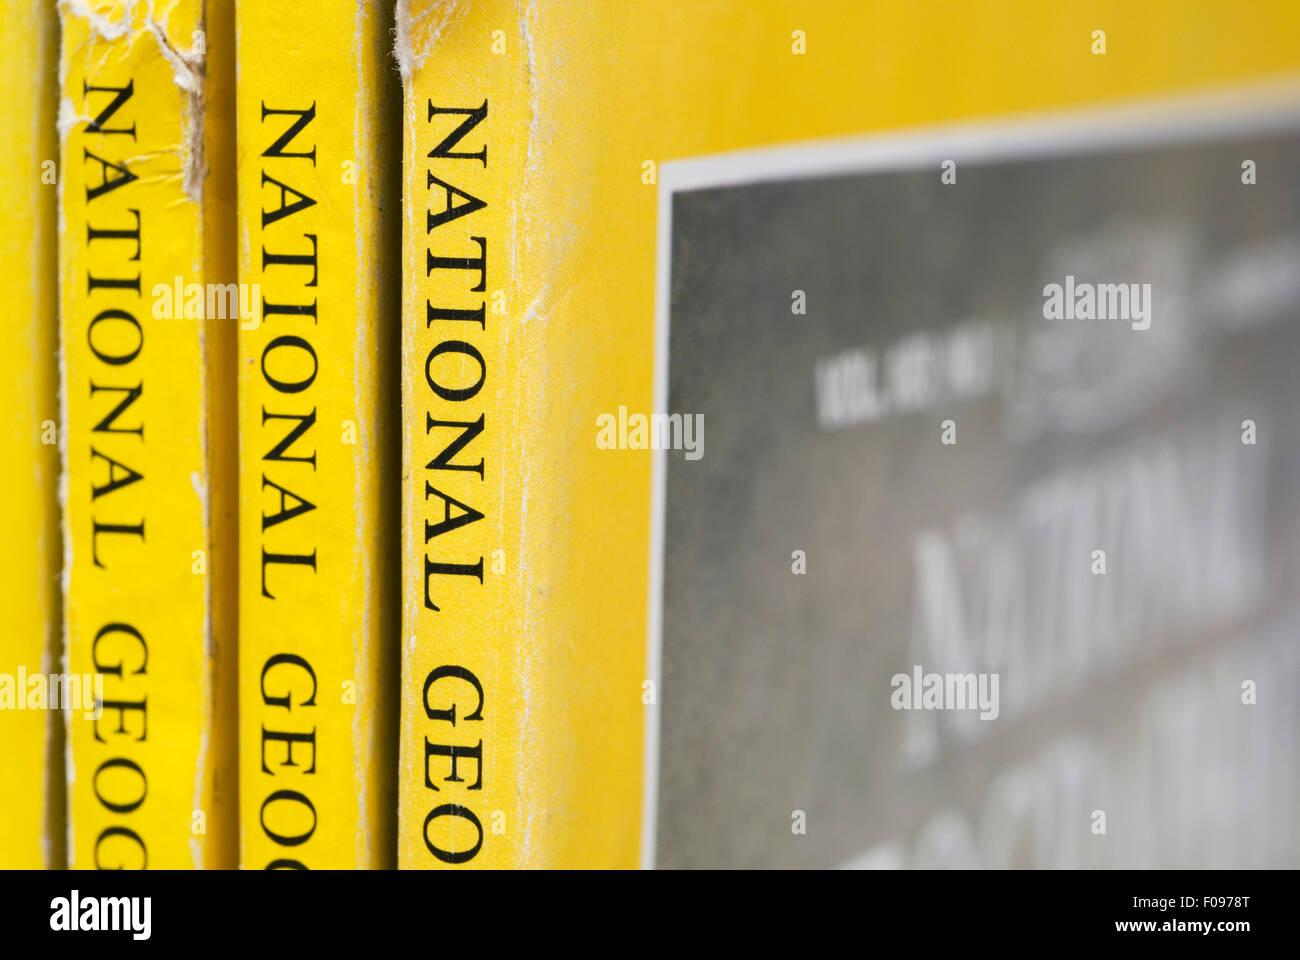 old National Geographic magazines - Stock Image